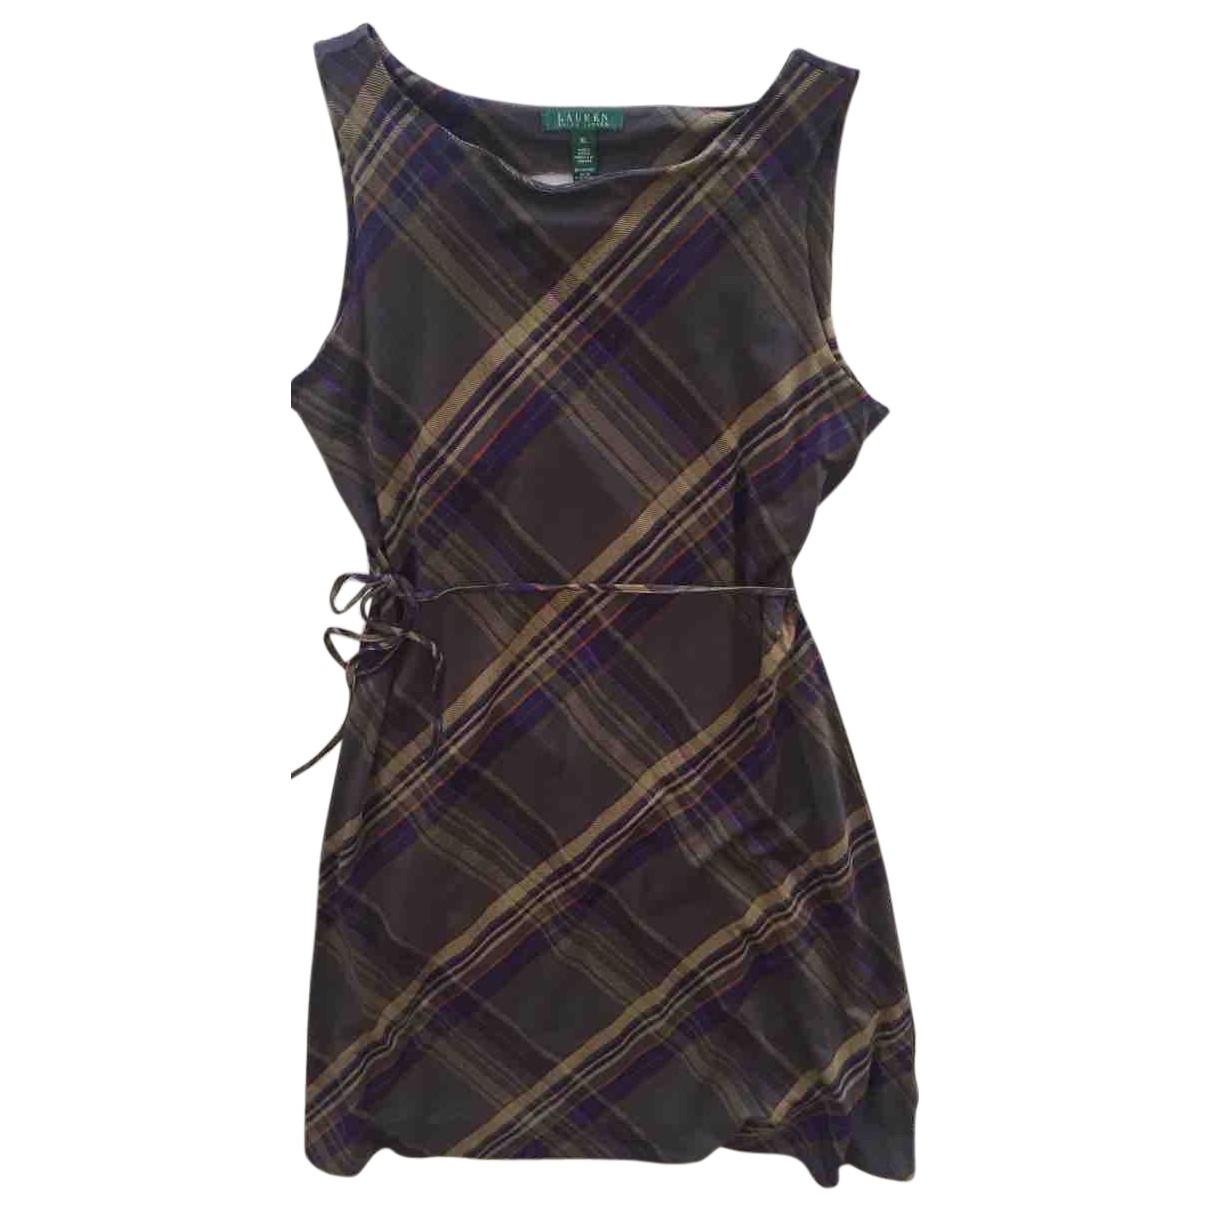 Lauren Ralph Lauren \N Multicolour Cotton - elasthane dress for Women XL International